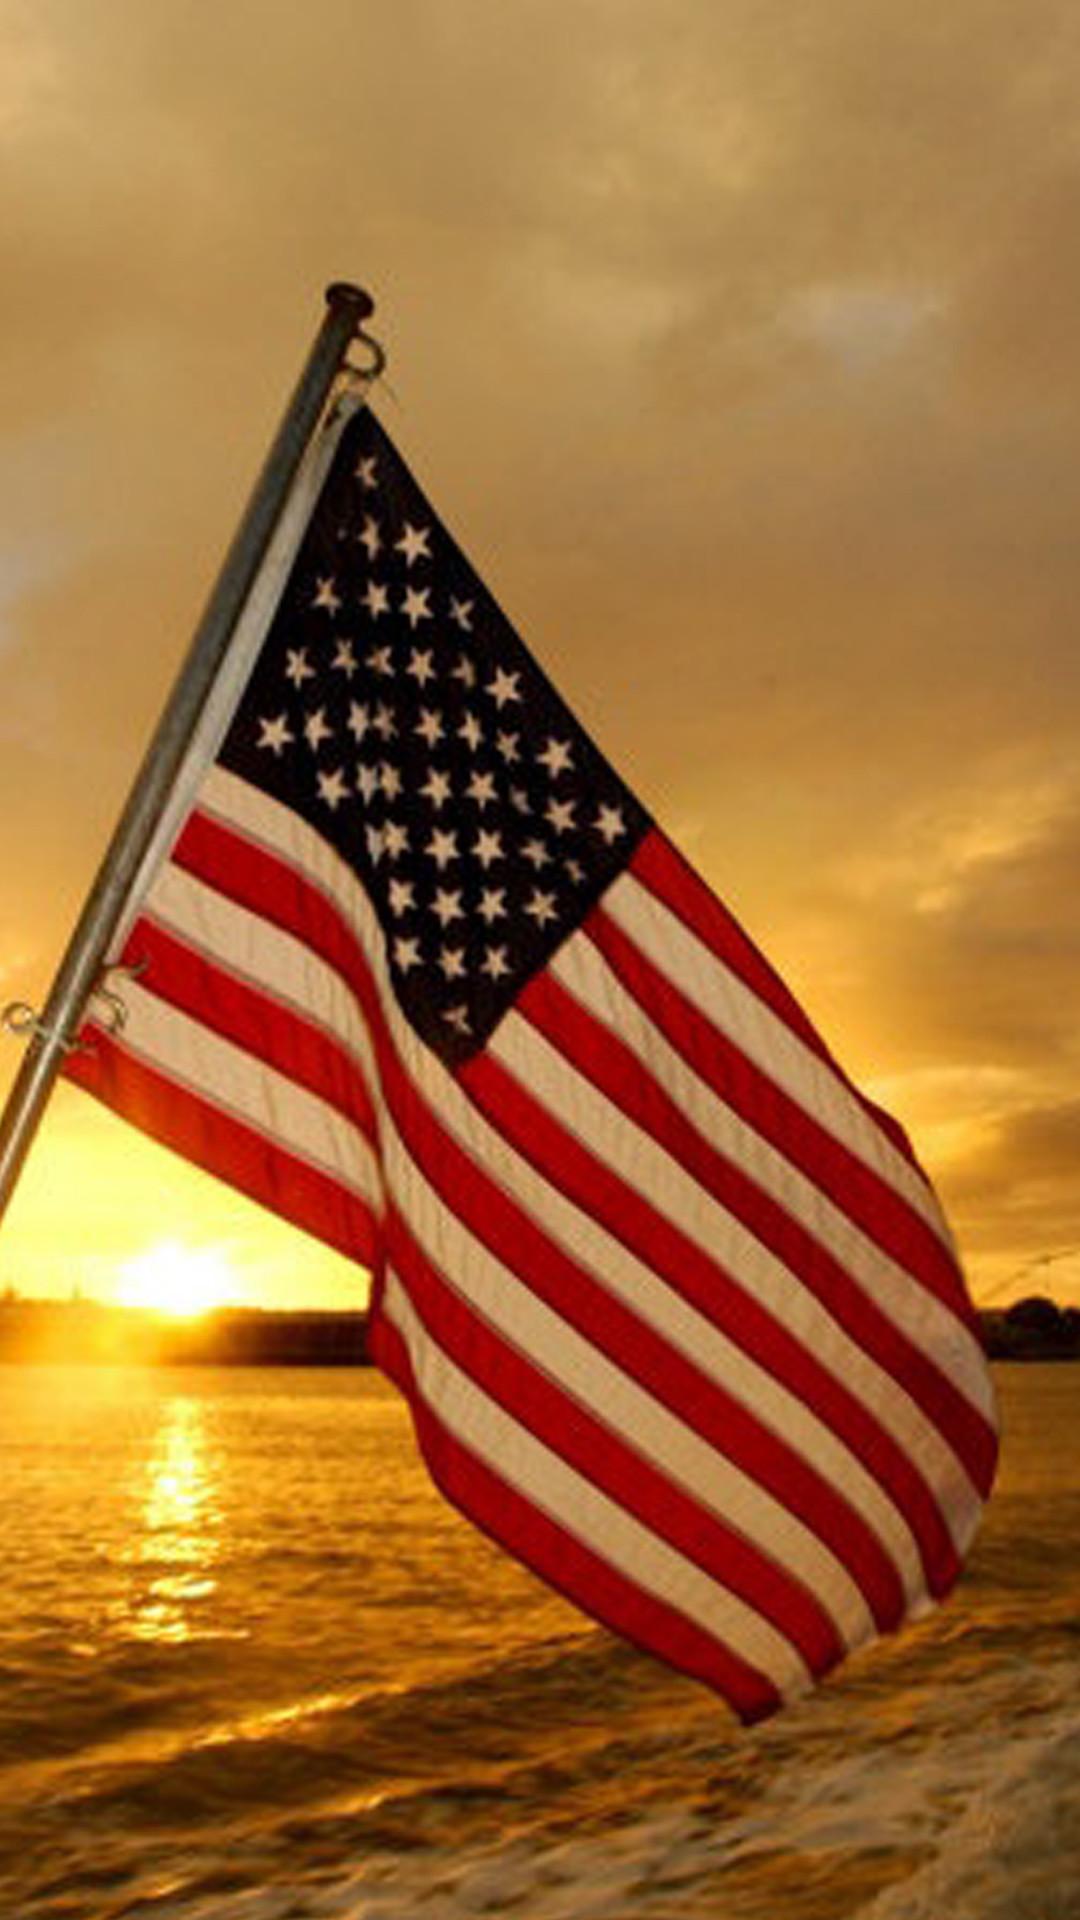 American Flag ios 10 wallpaper American Flag ios 9 wallpaper iphone 6